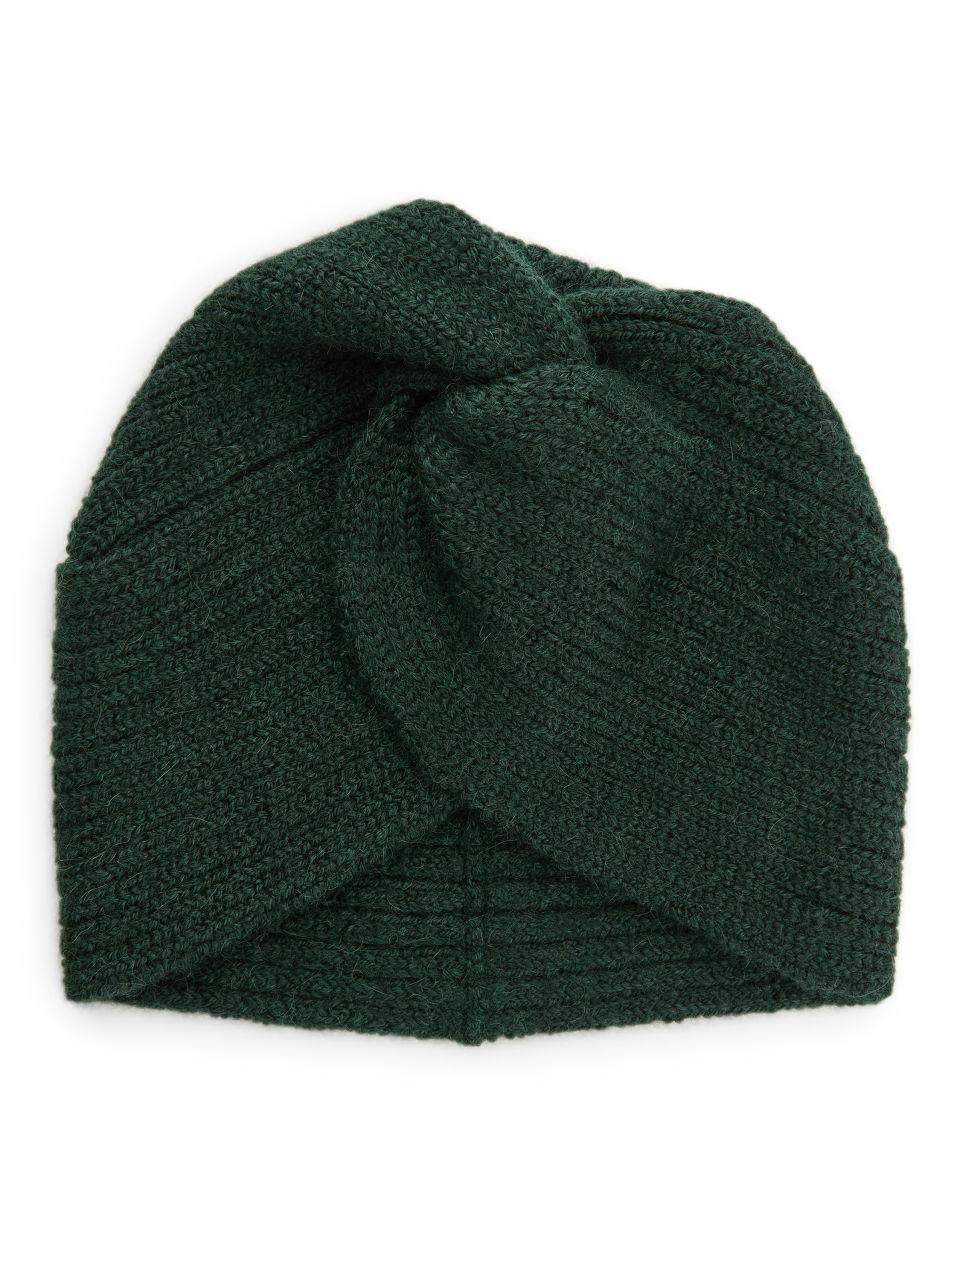 Alpaca Twisted Beanie - Green